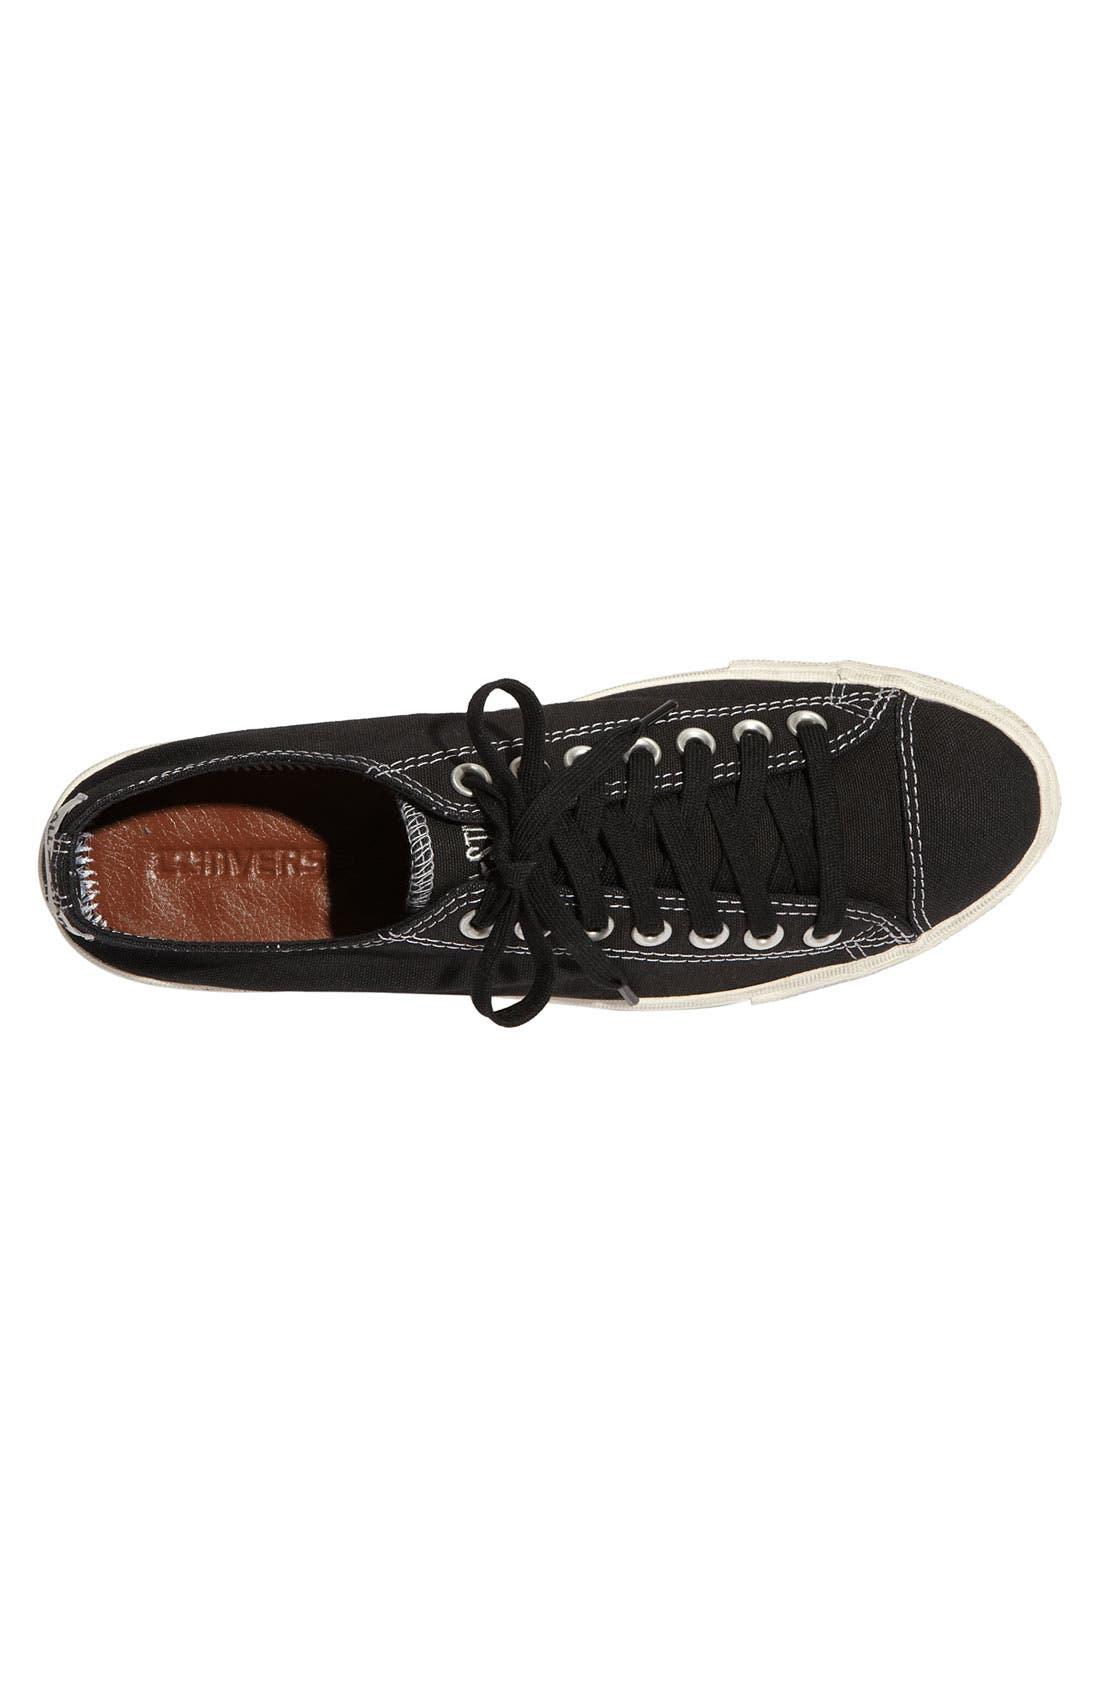 Chuck Taylor<sup>®</sup> 'AS Coast' Sneaker,                             Alternate thumbnail 4, color,                             001